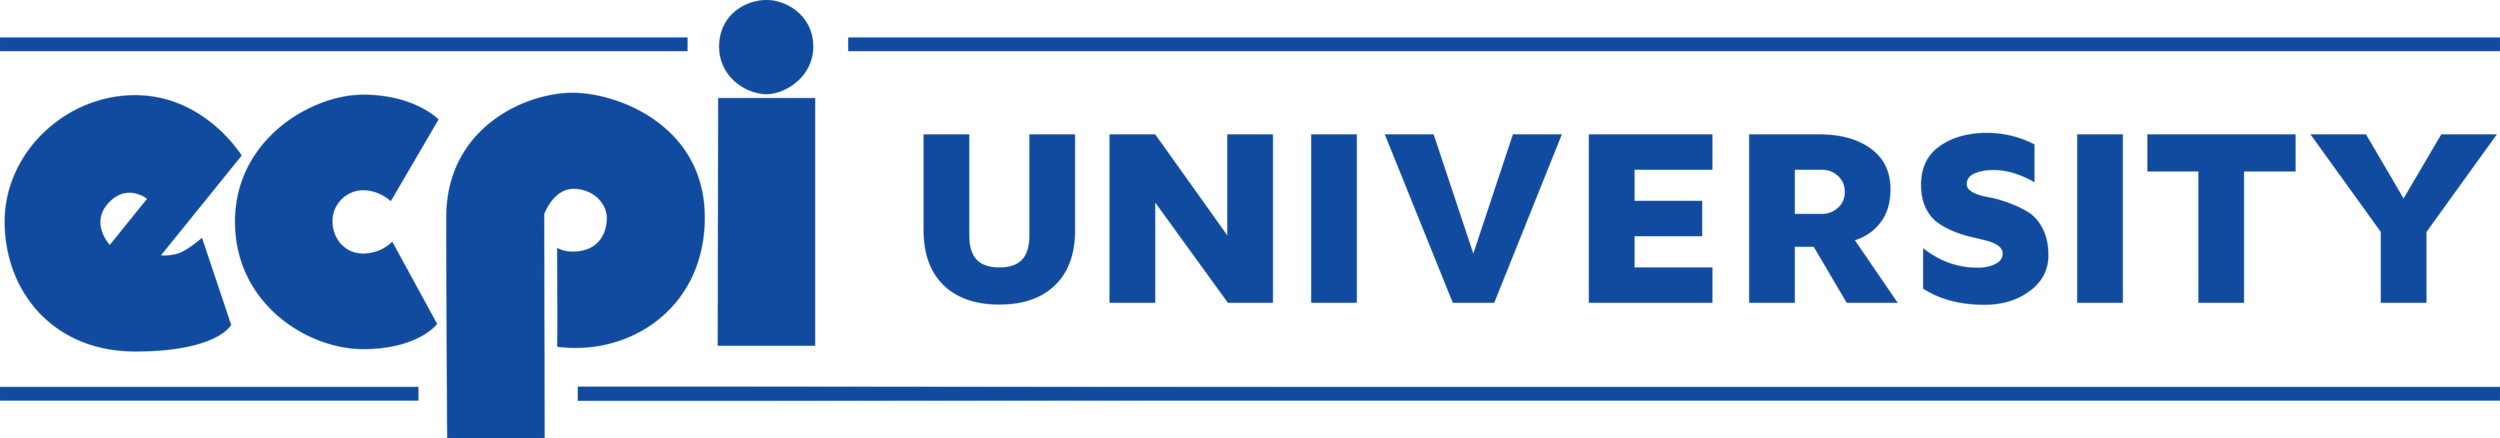 logo-ecpi1.png